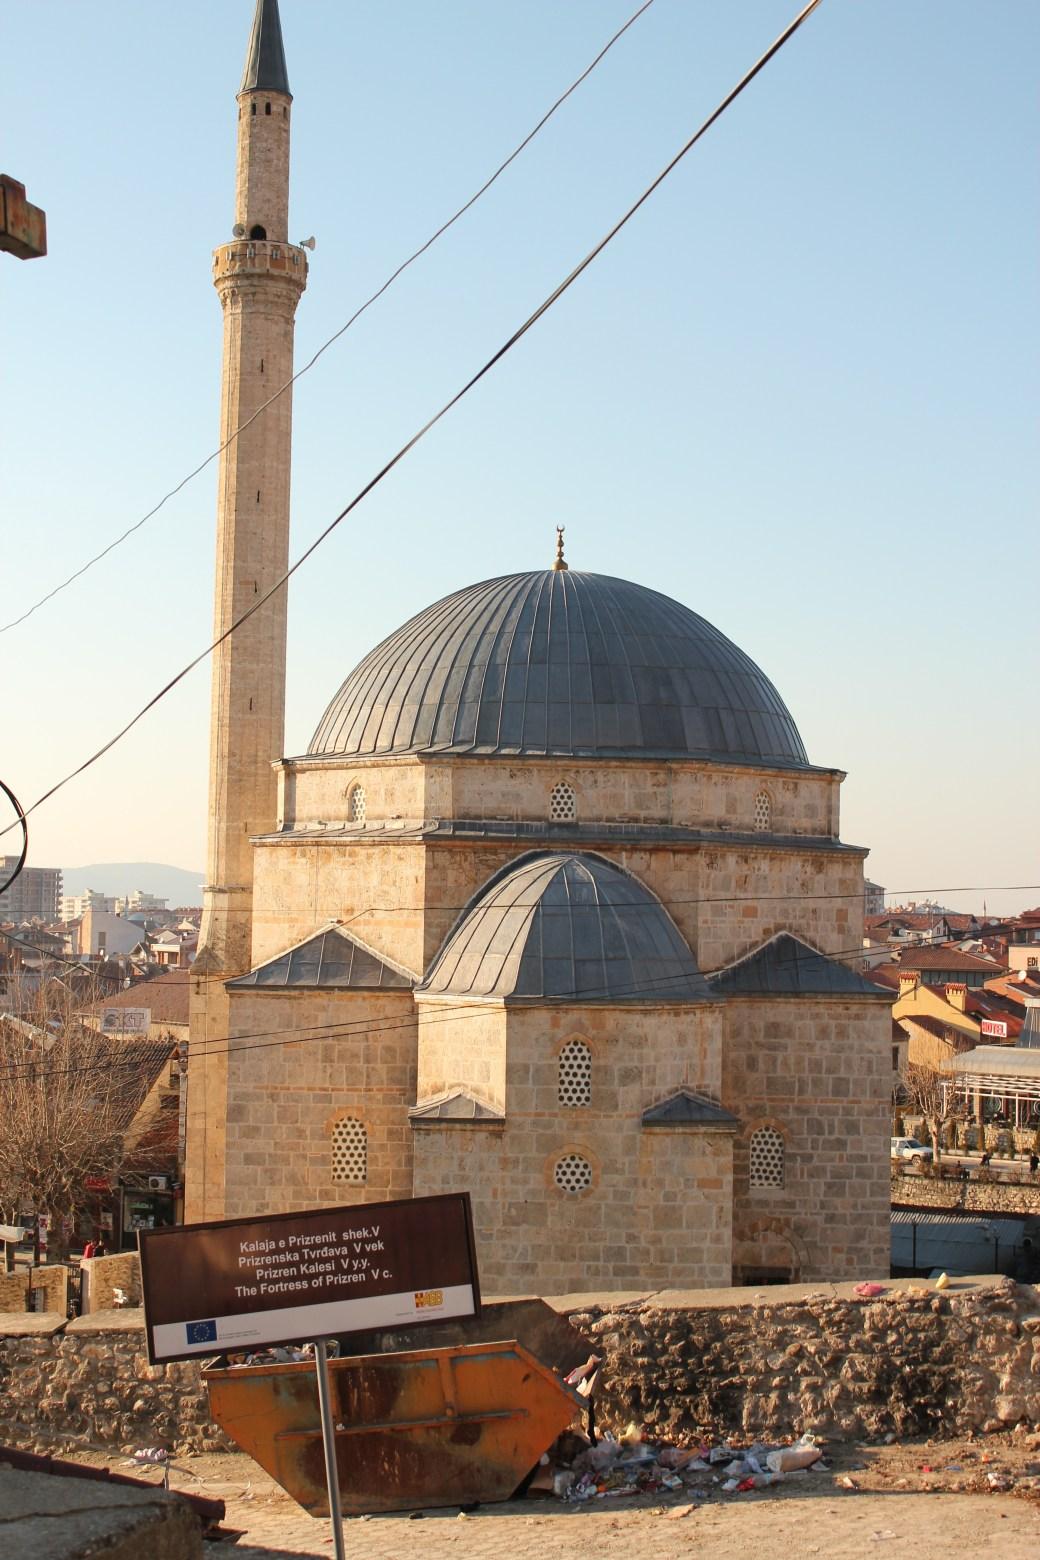 Church; Prizren, Kosovo; 2013